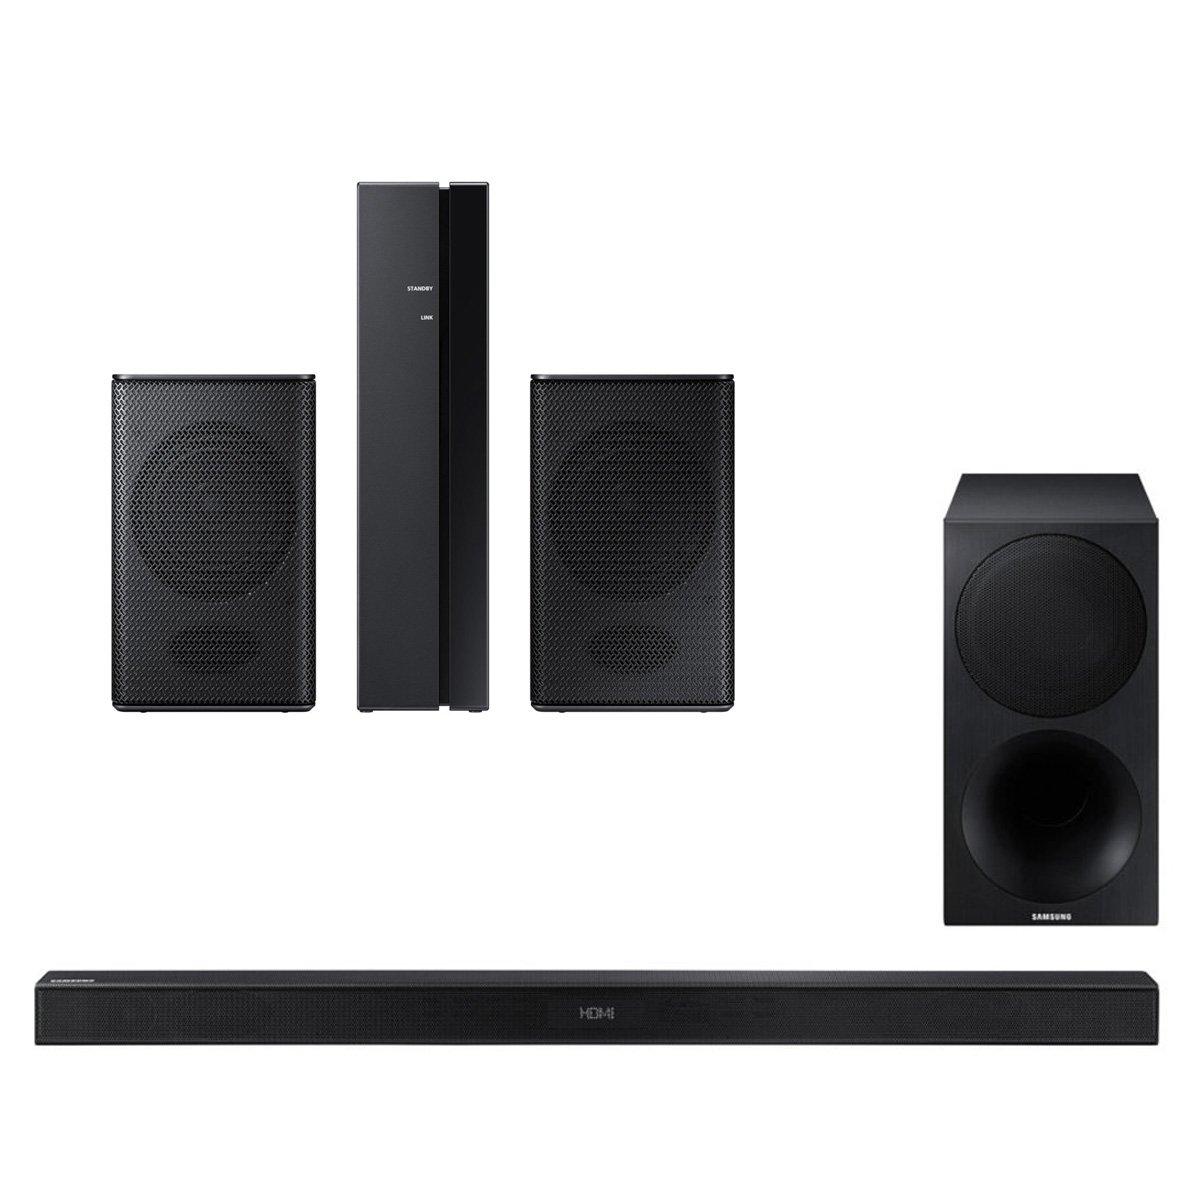 Samsung HW-M550 340W 3.1 Channel Soundbar with Wireless Subwoofer and SWA-8500S Wireless Rear Speakers Kit